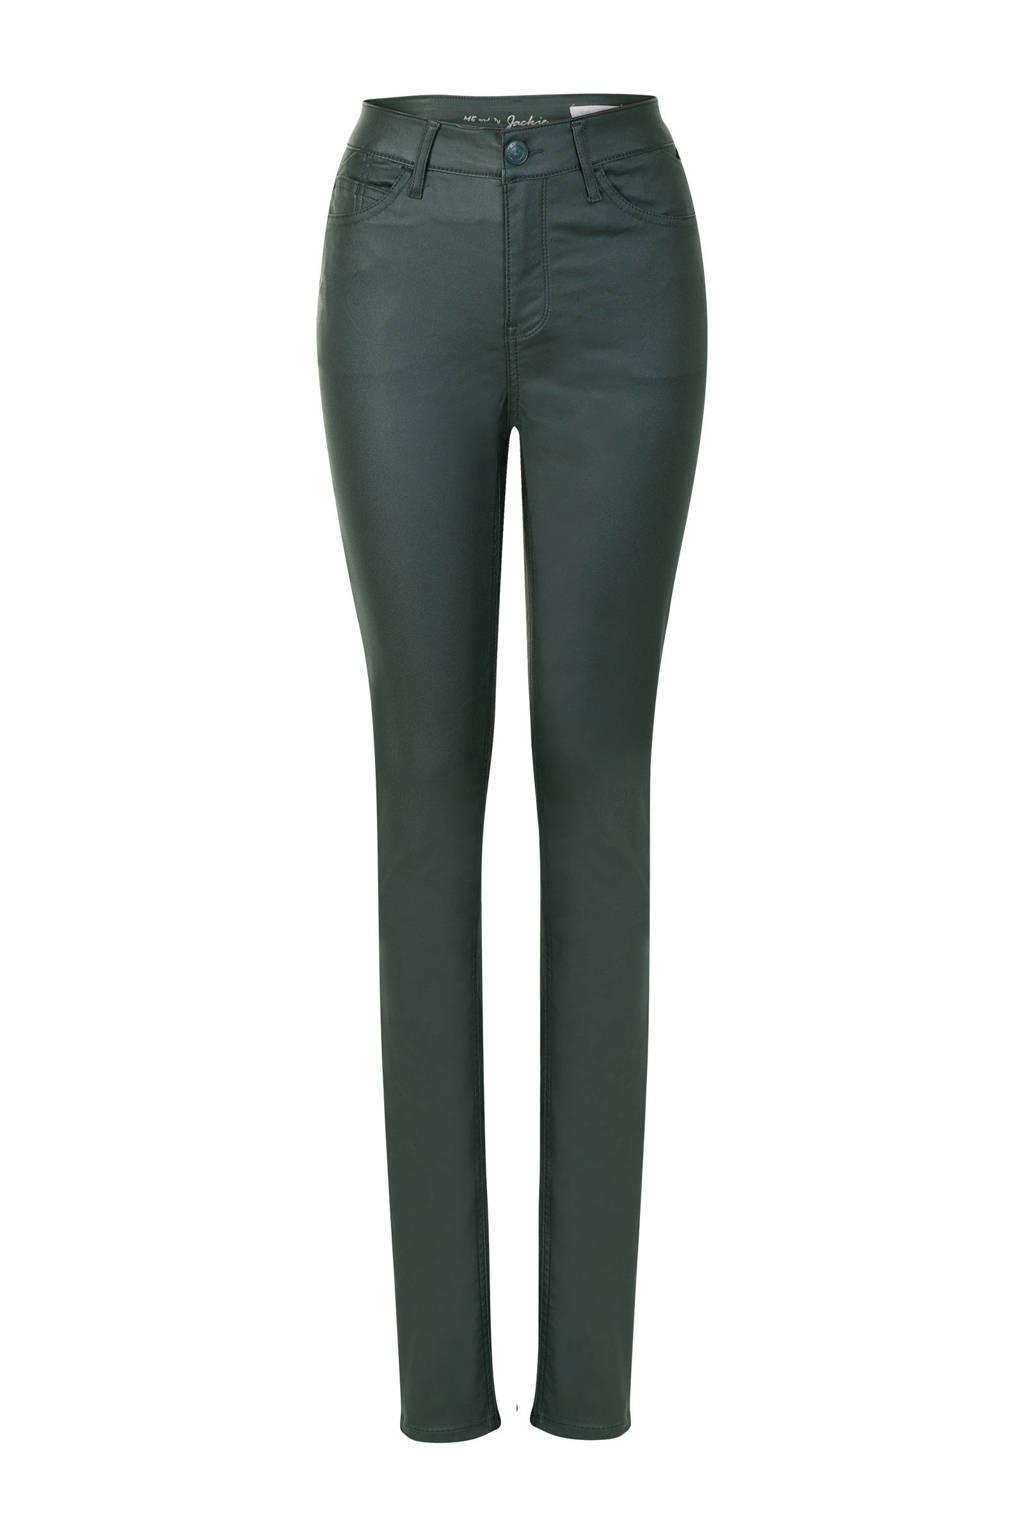 Miss Etam Lang 5-pocket broek donkergroen, Donkergroen